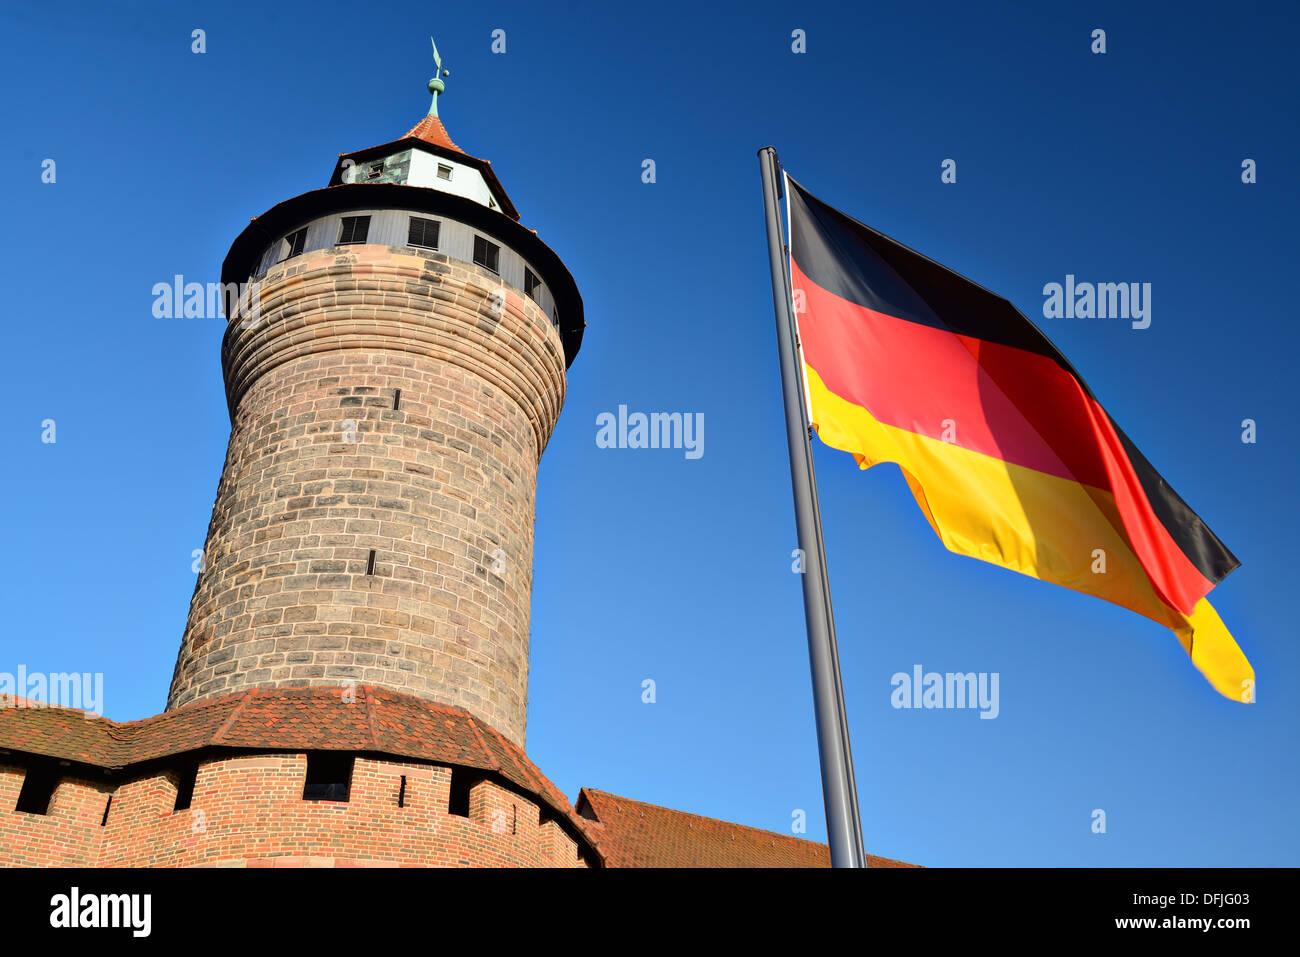 Drapeau allemand vole à Château de Nuremberg à Nuremberg, Allemagne. Photo Stock